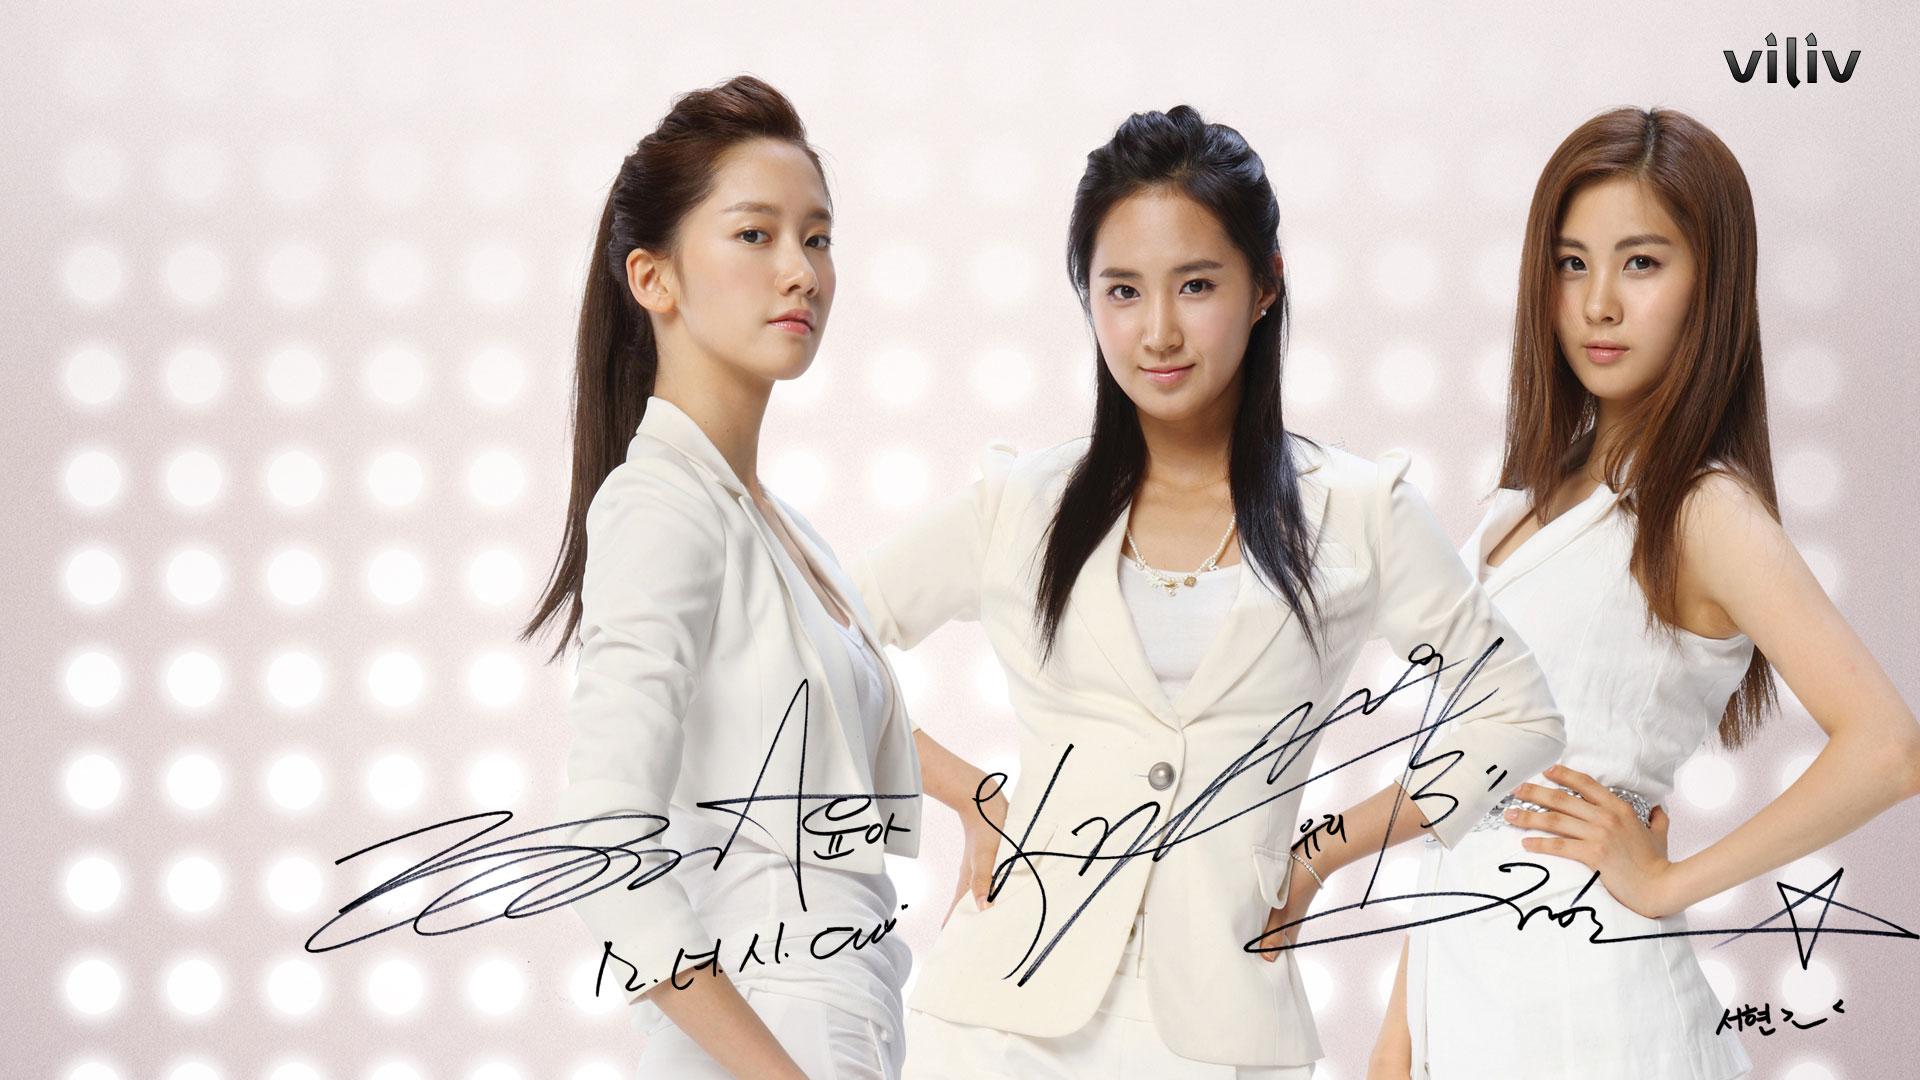 SNSD Yoona Yuri Seohyun Viliv wallpaper 2009